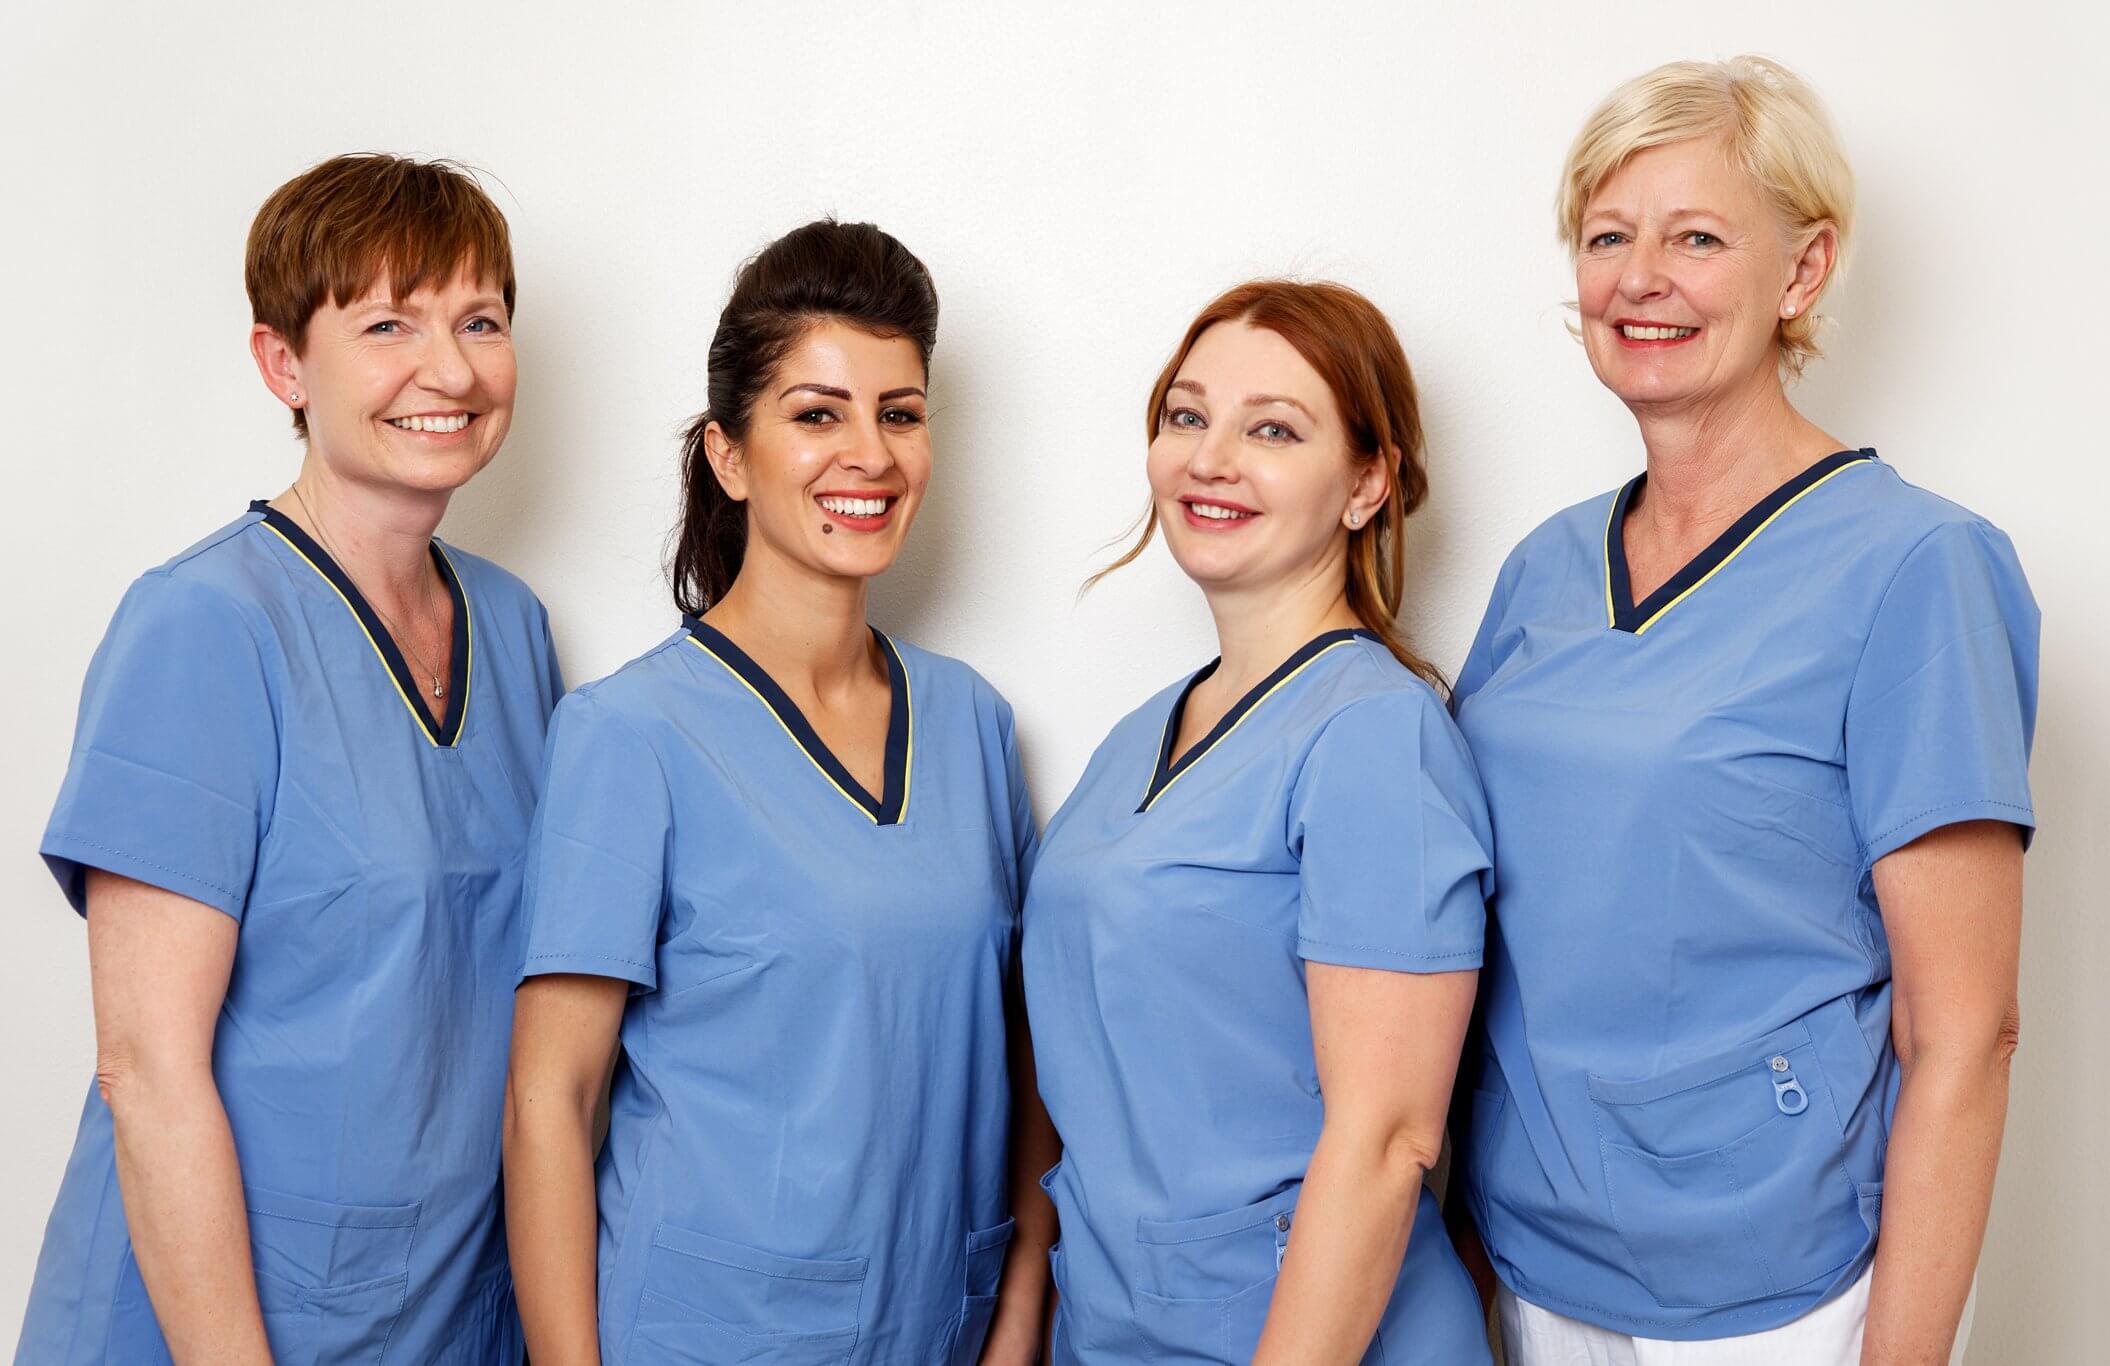 Tannbehandling - Tannlege i Oslo